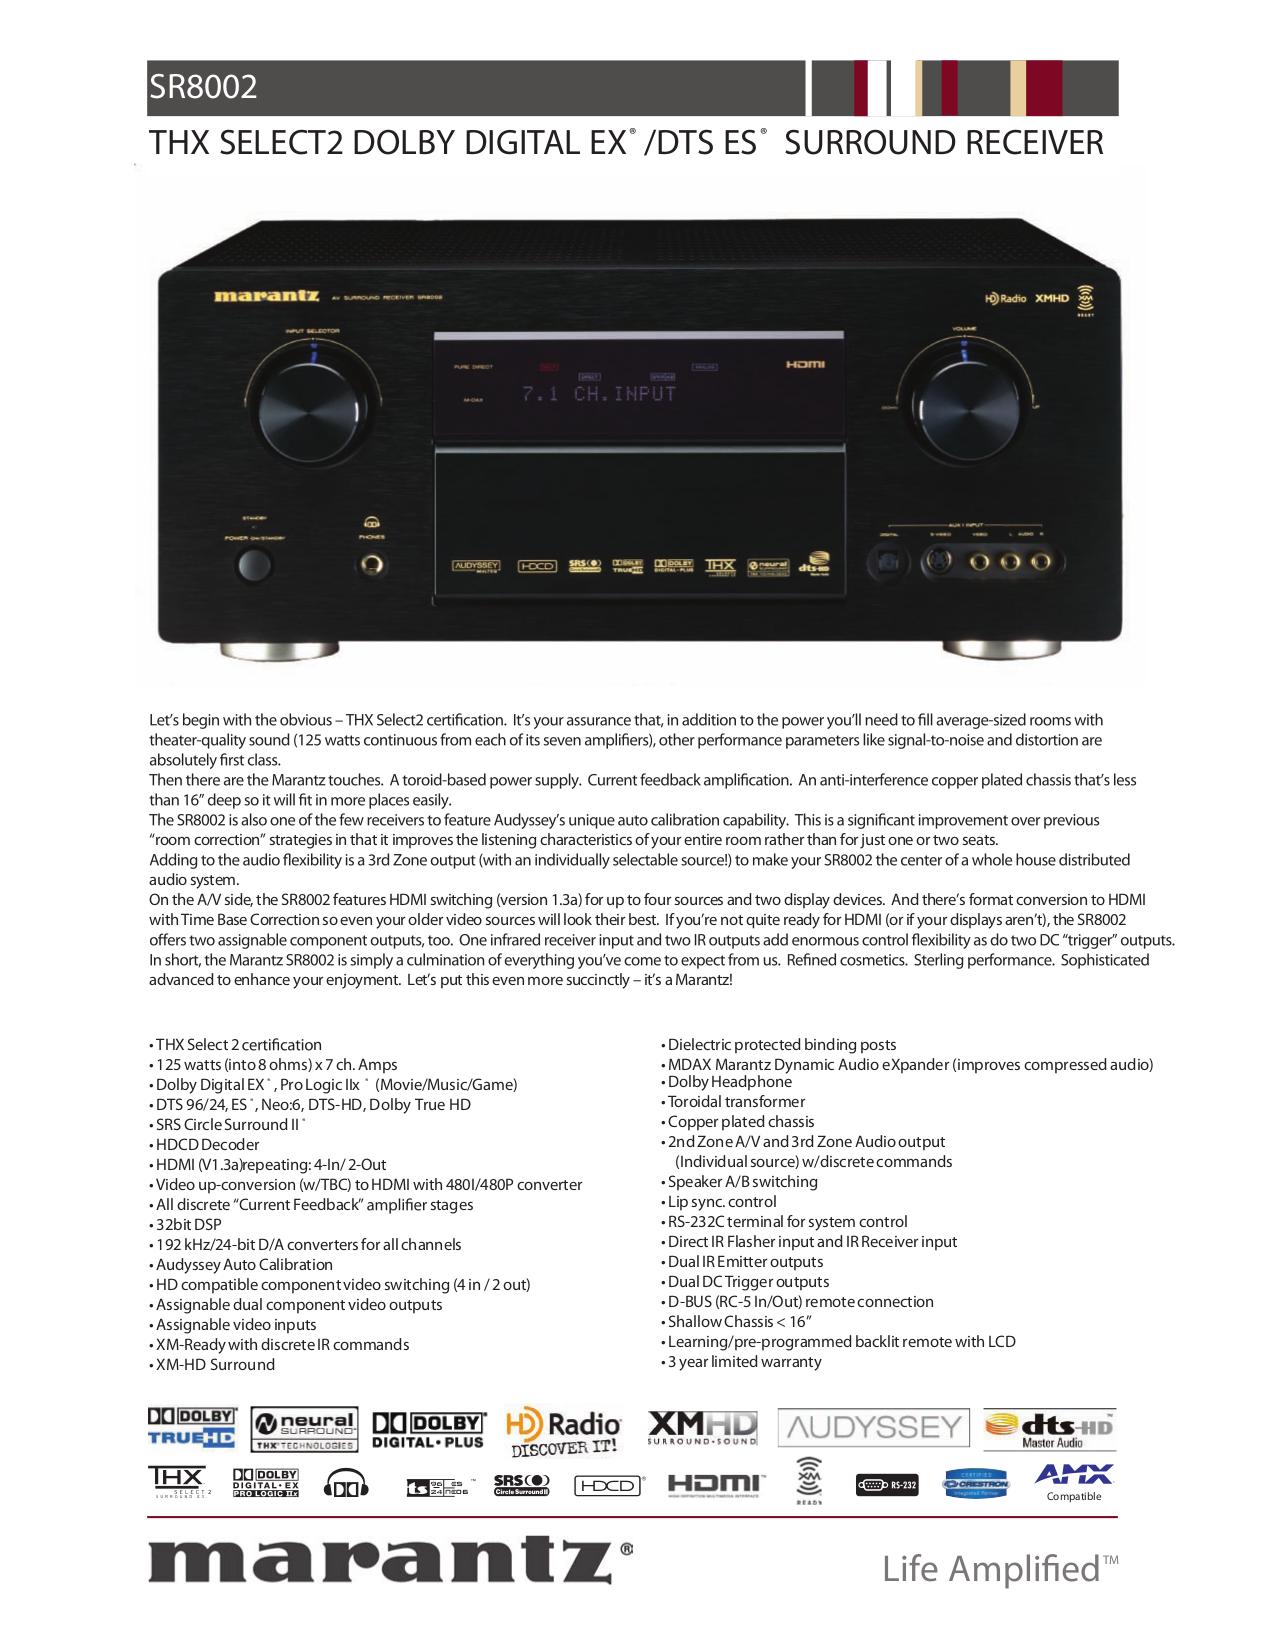 download free pdf for marantz sr8001 receiver manual rh umlib com Marantz SR8001 Receiver Marantz SR8001 Receiver